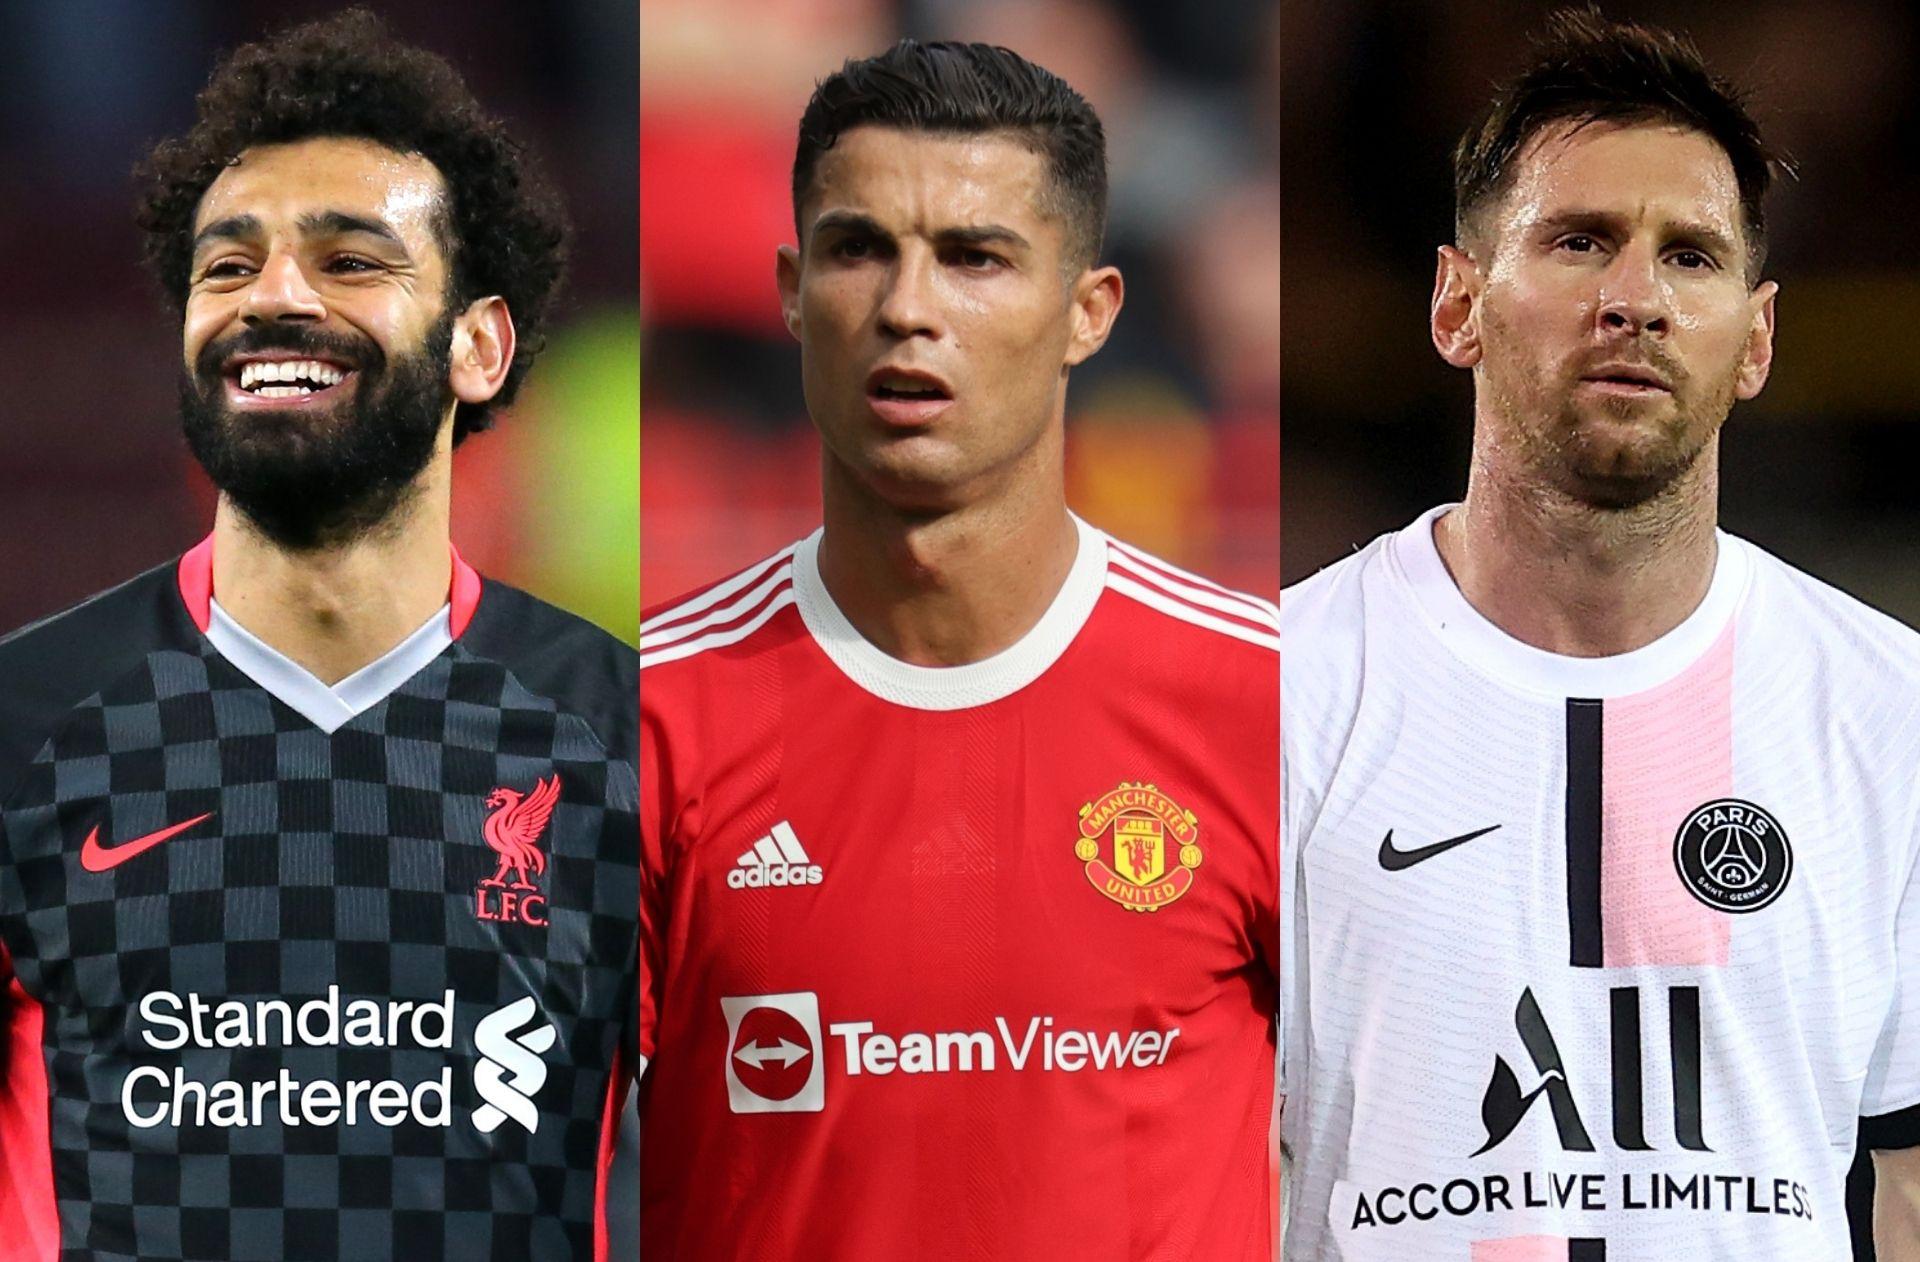 Mohamed Salah, Cristiano Ronaldo, Lionel Messi